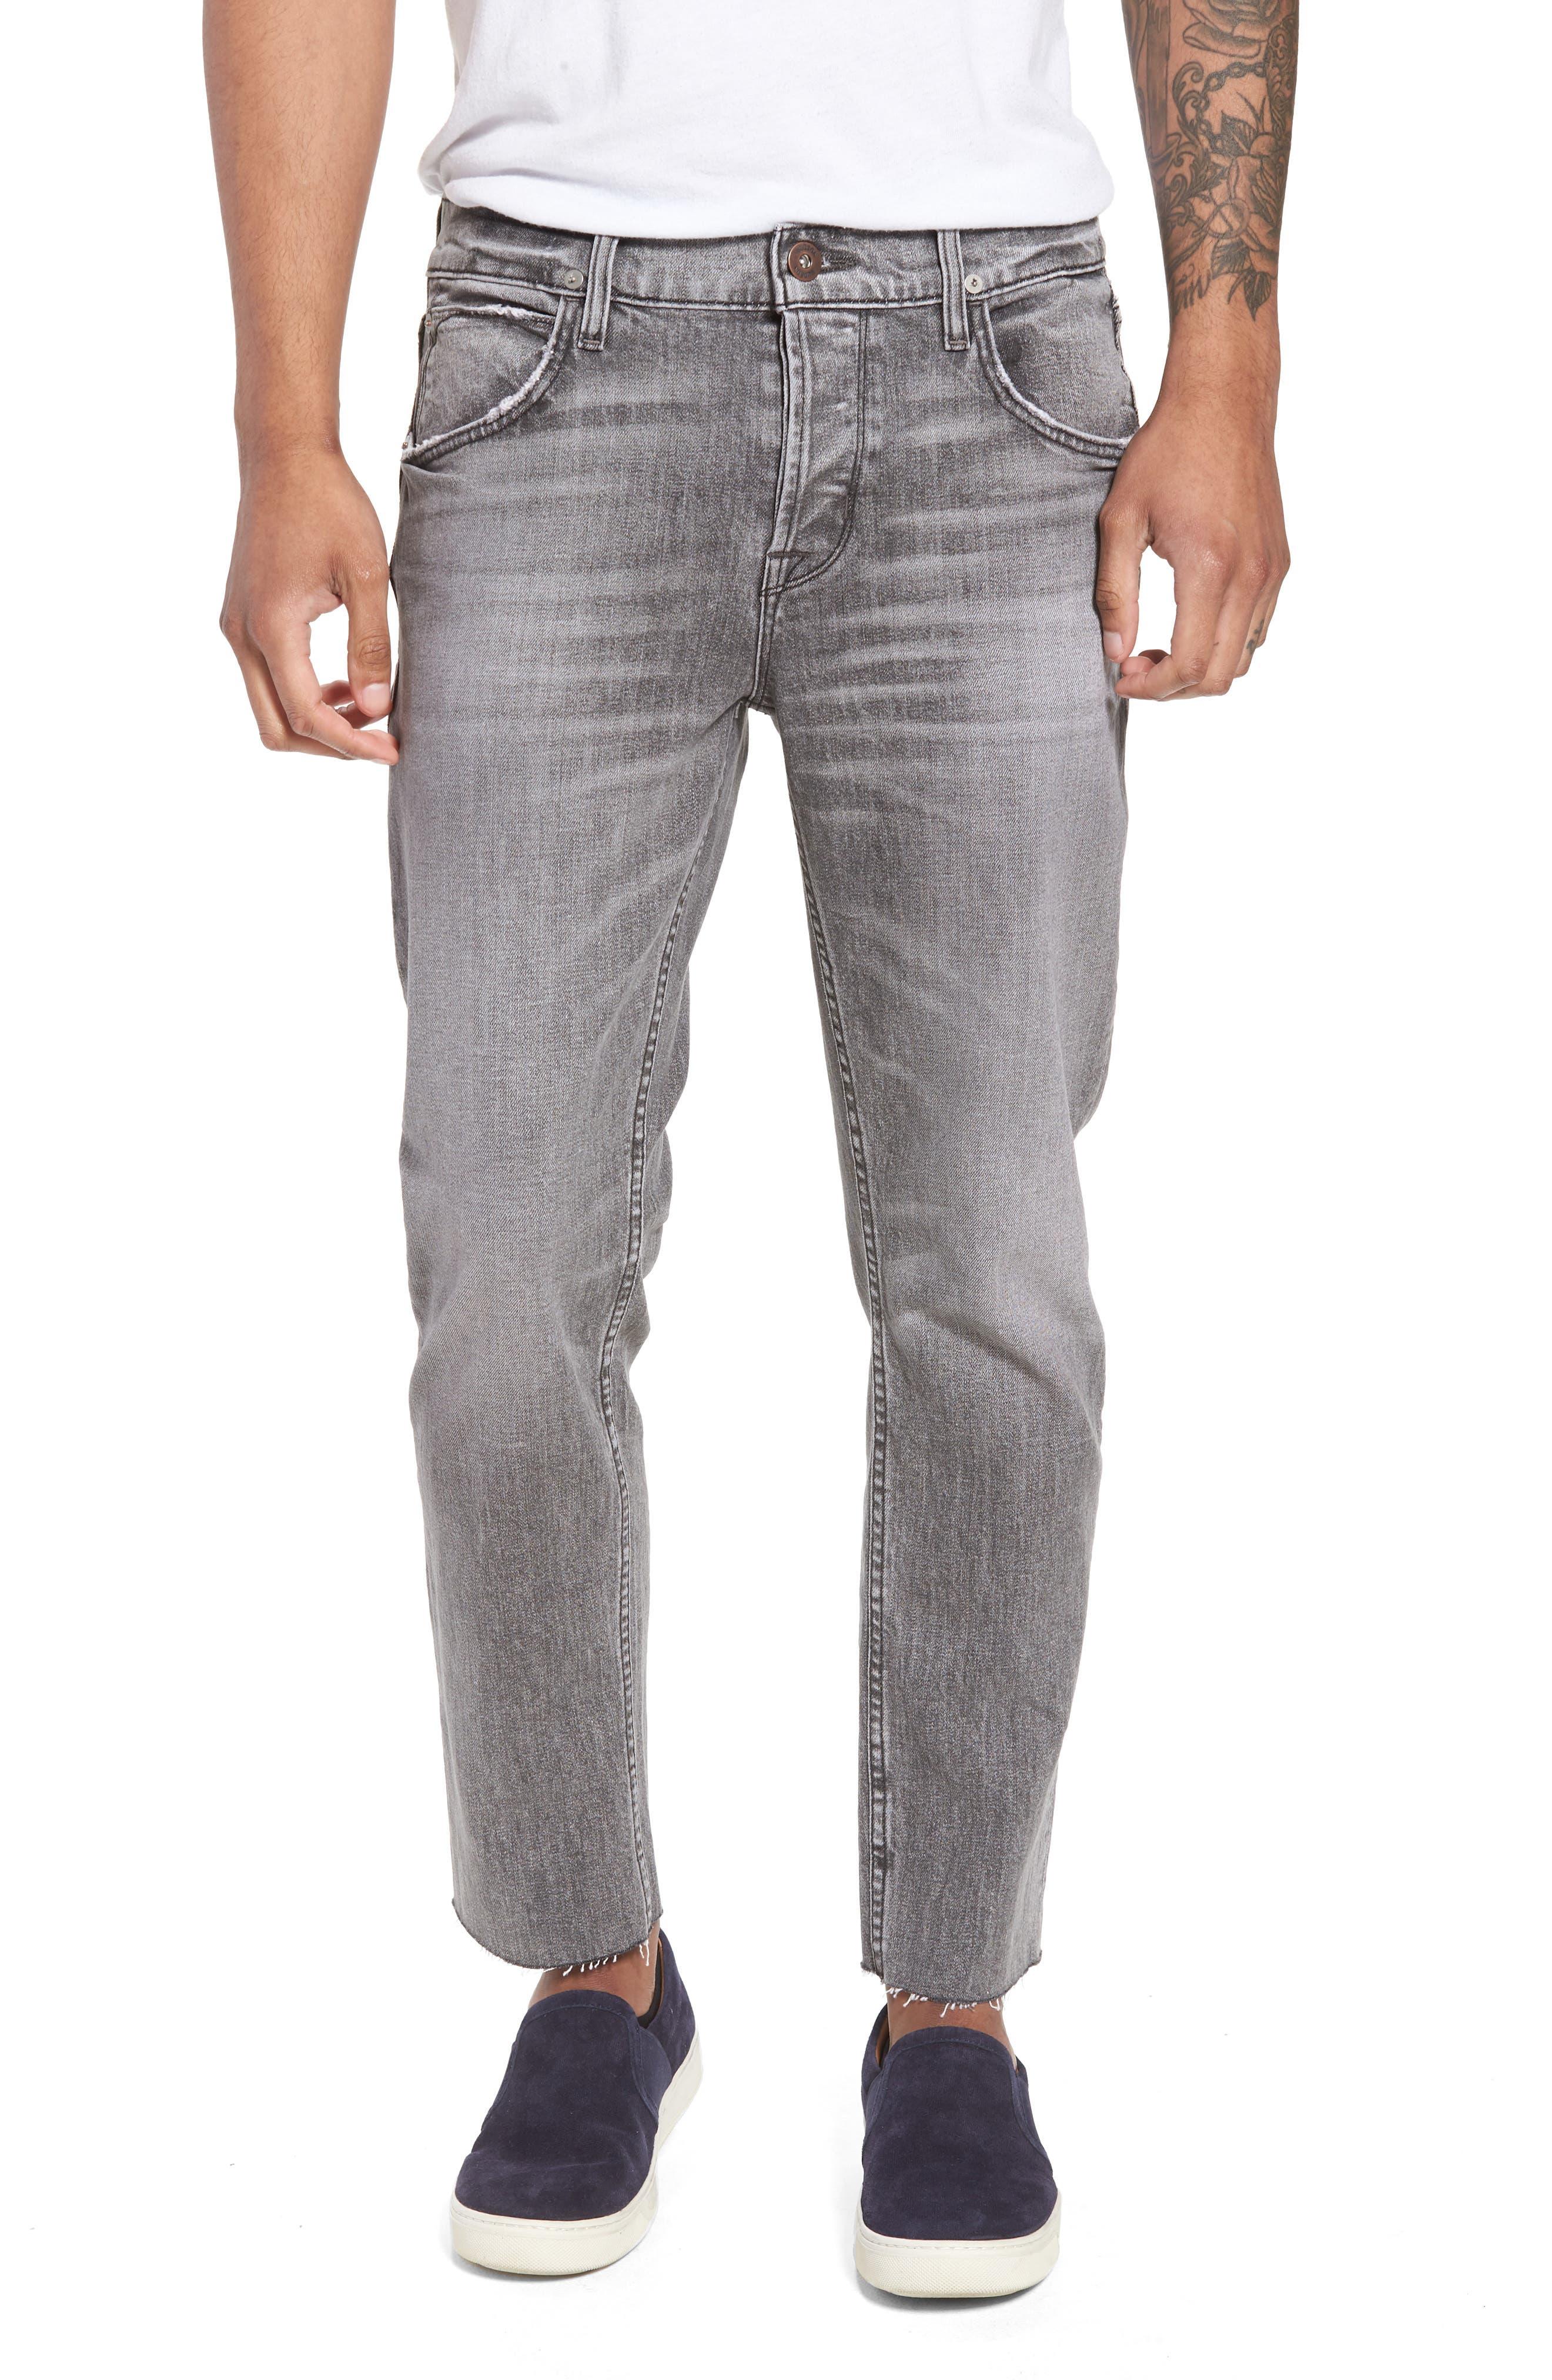 Blake Slim Fit Jeans,                         Main,                         color, Chrome